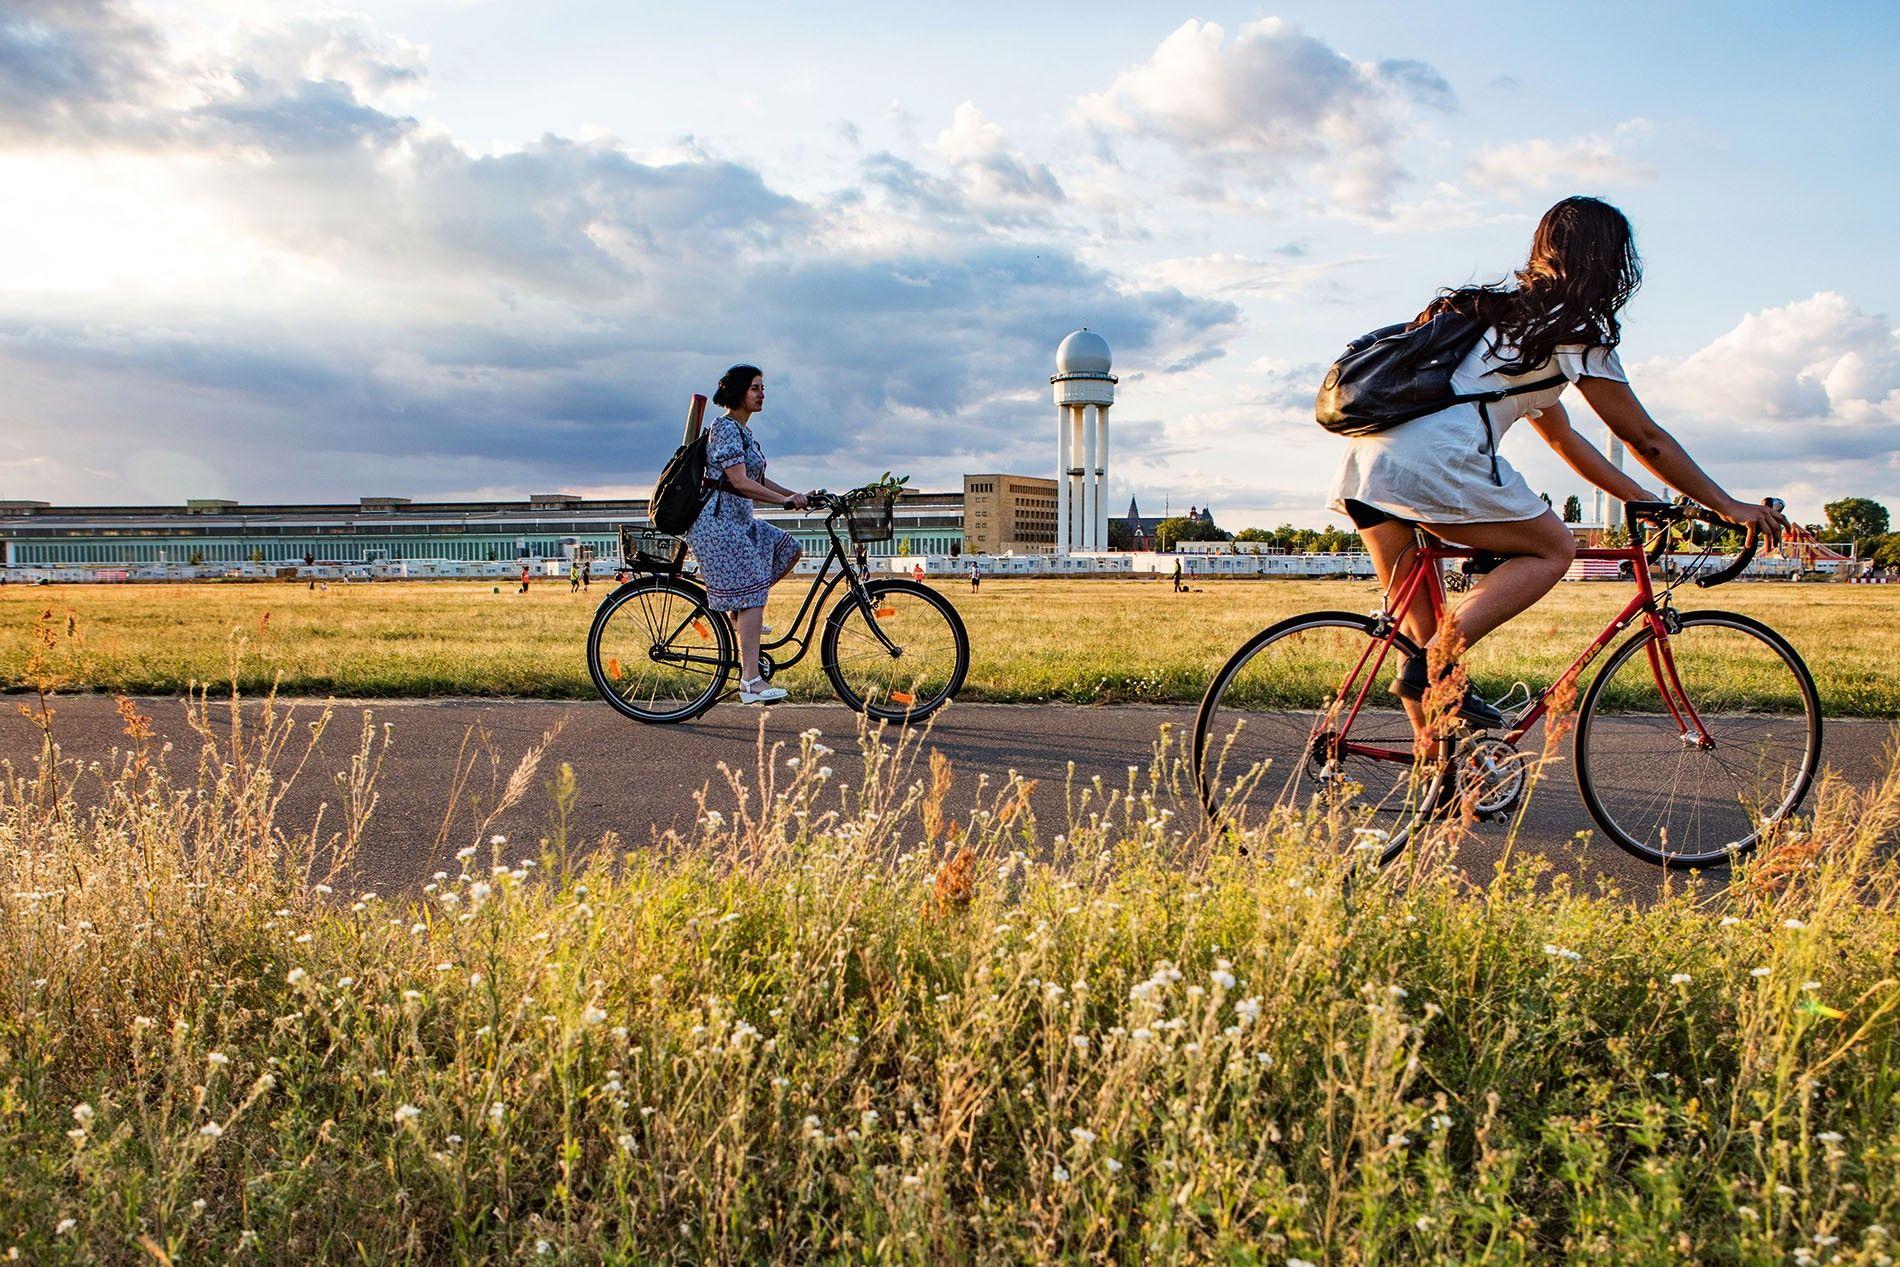 Cycling through Tempelhofer Feld